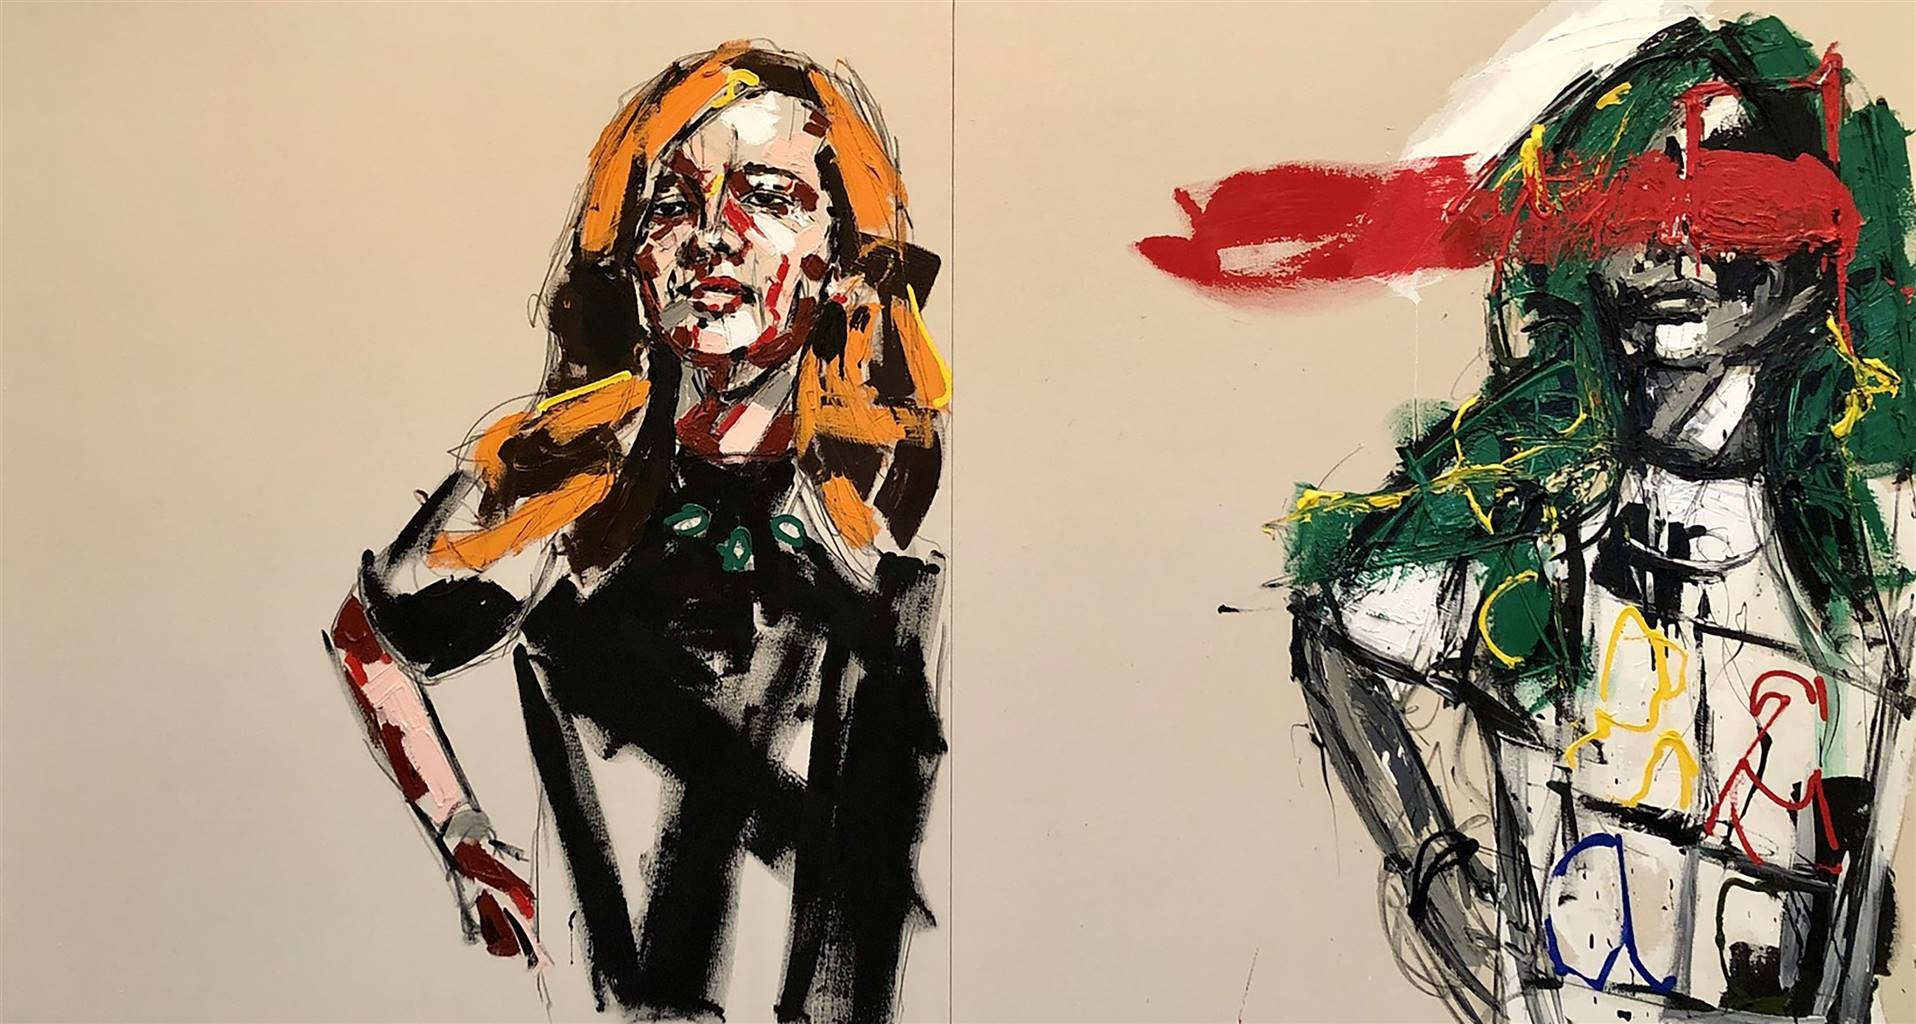 Nick Bautista, A Paradox Walks into a Bar, Acrylic & Charcoal on Canvas image